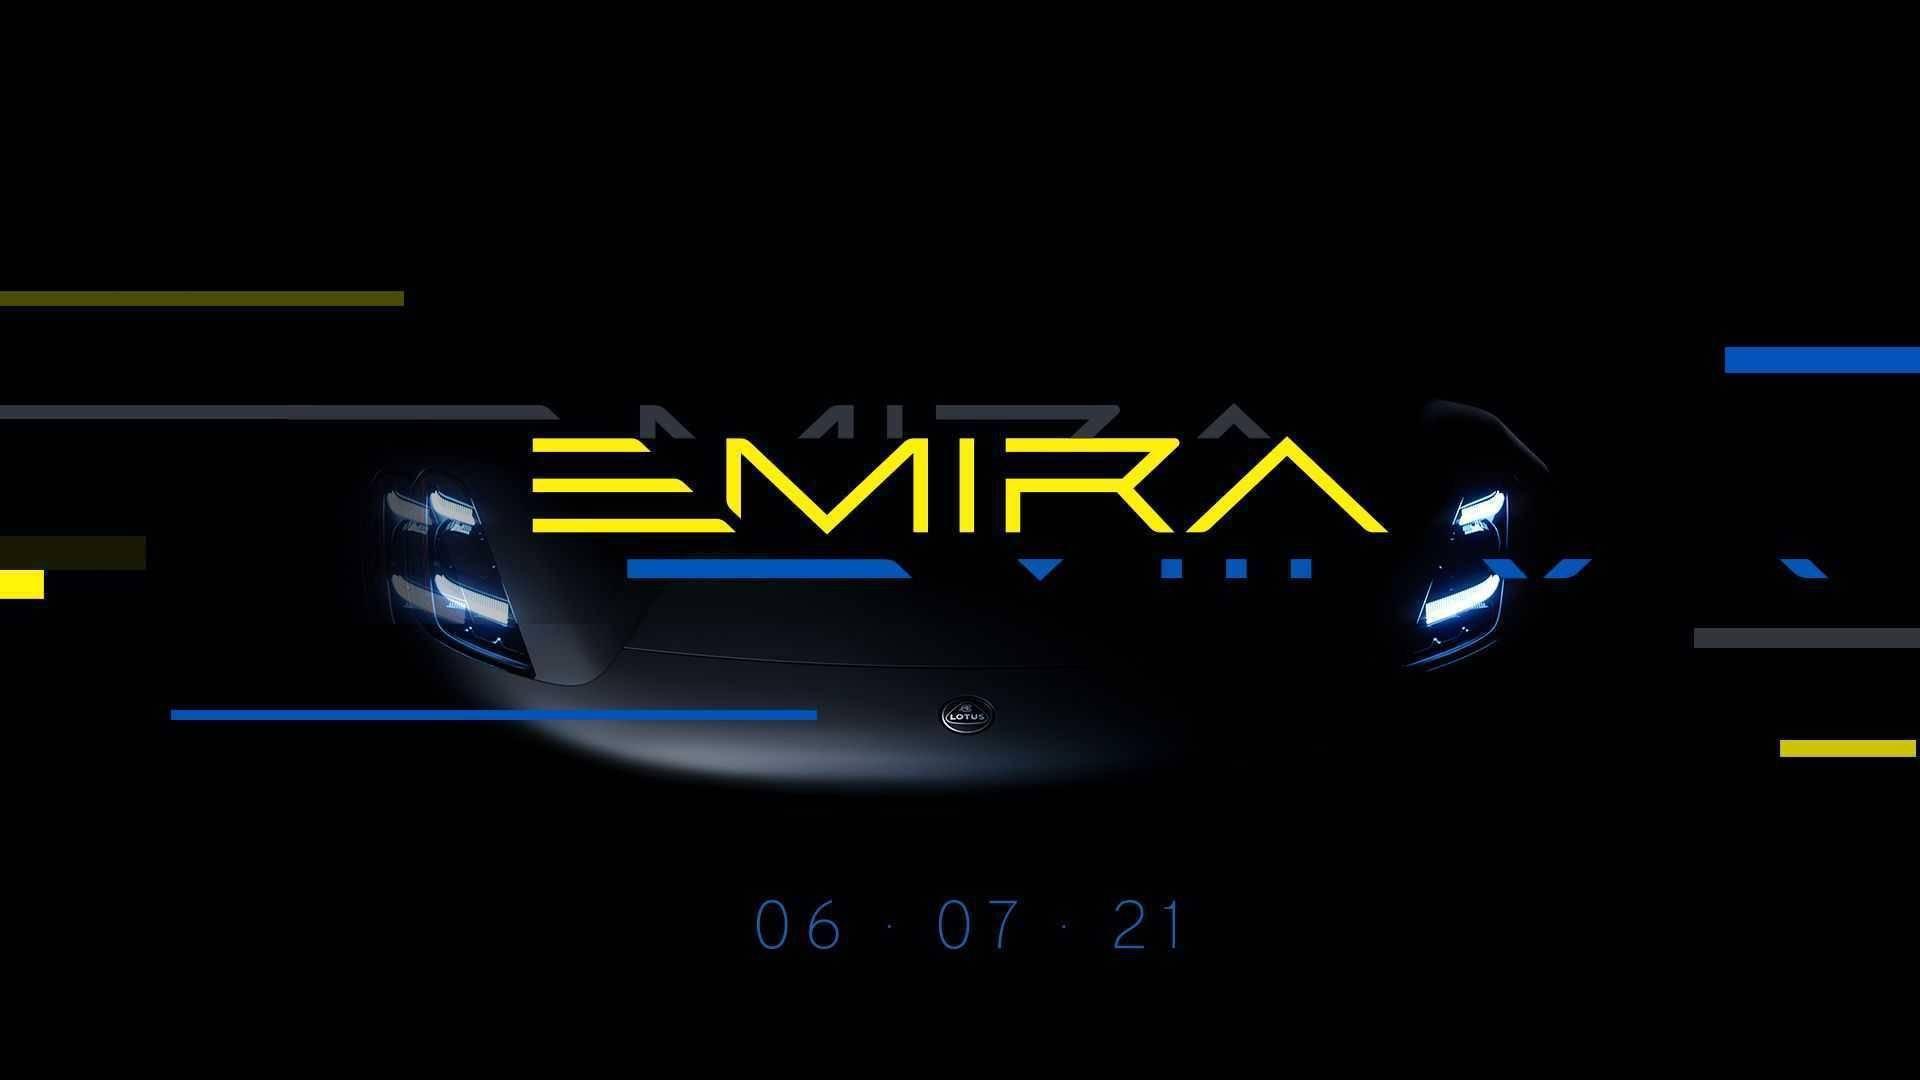 路特斯新车将定名EMIRA